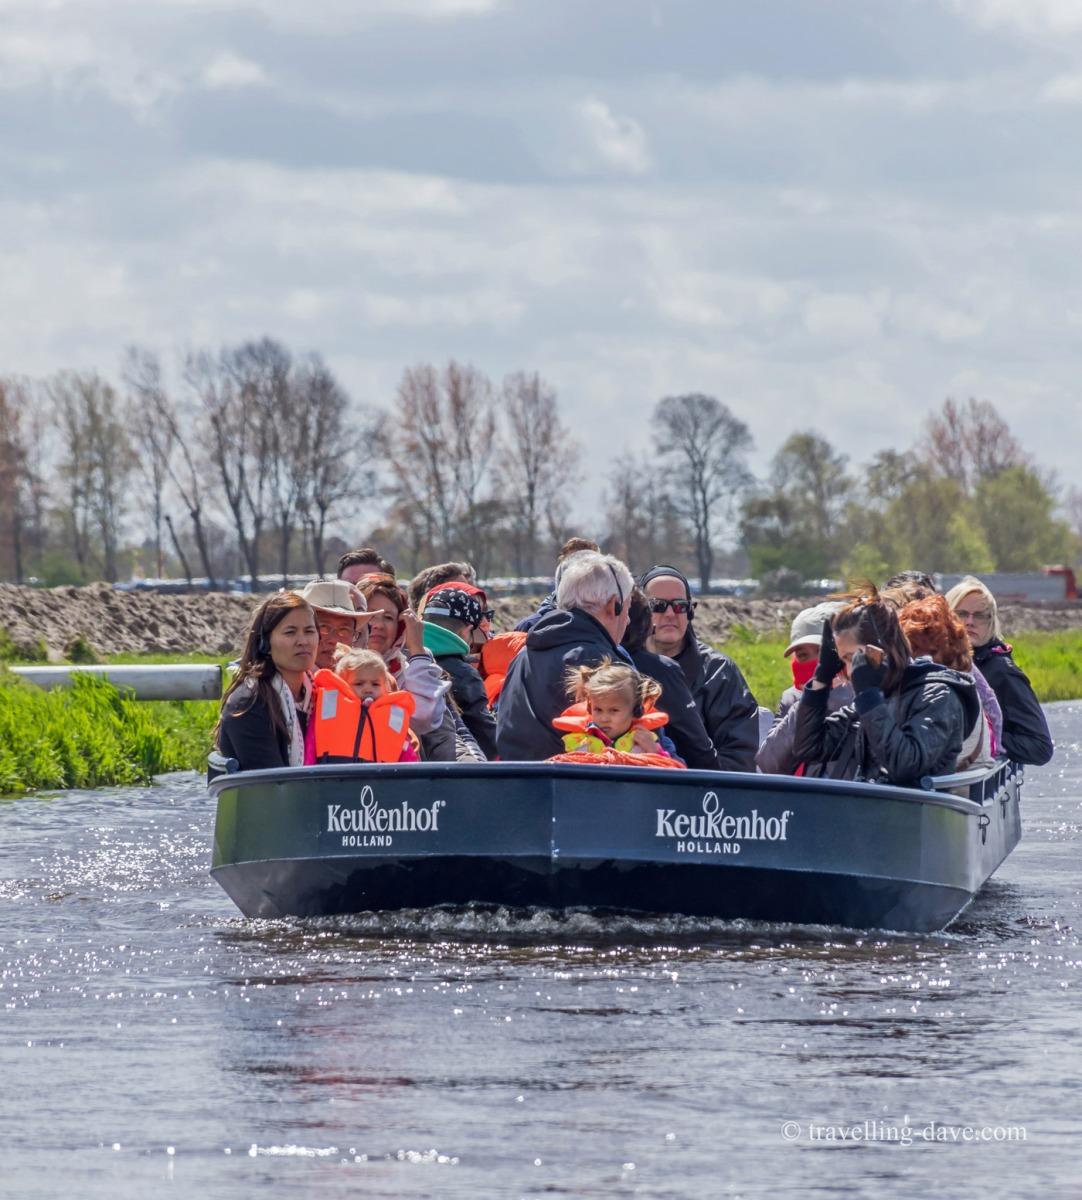 People on a boat at Keukenhof